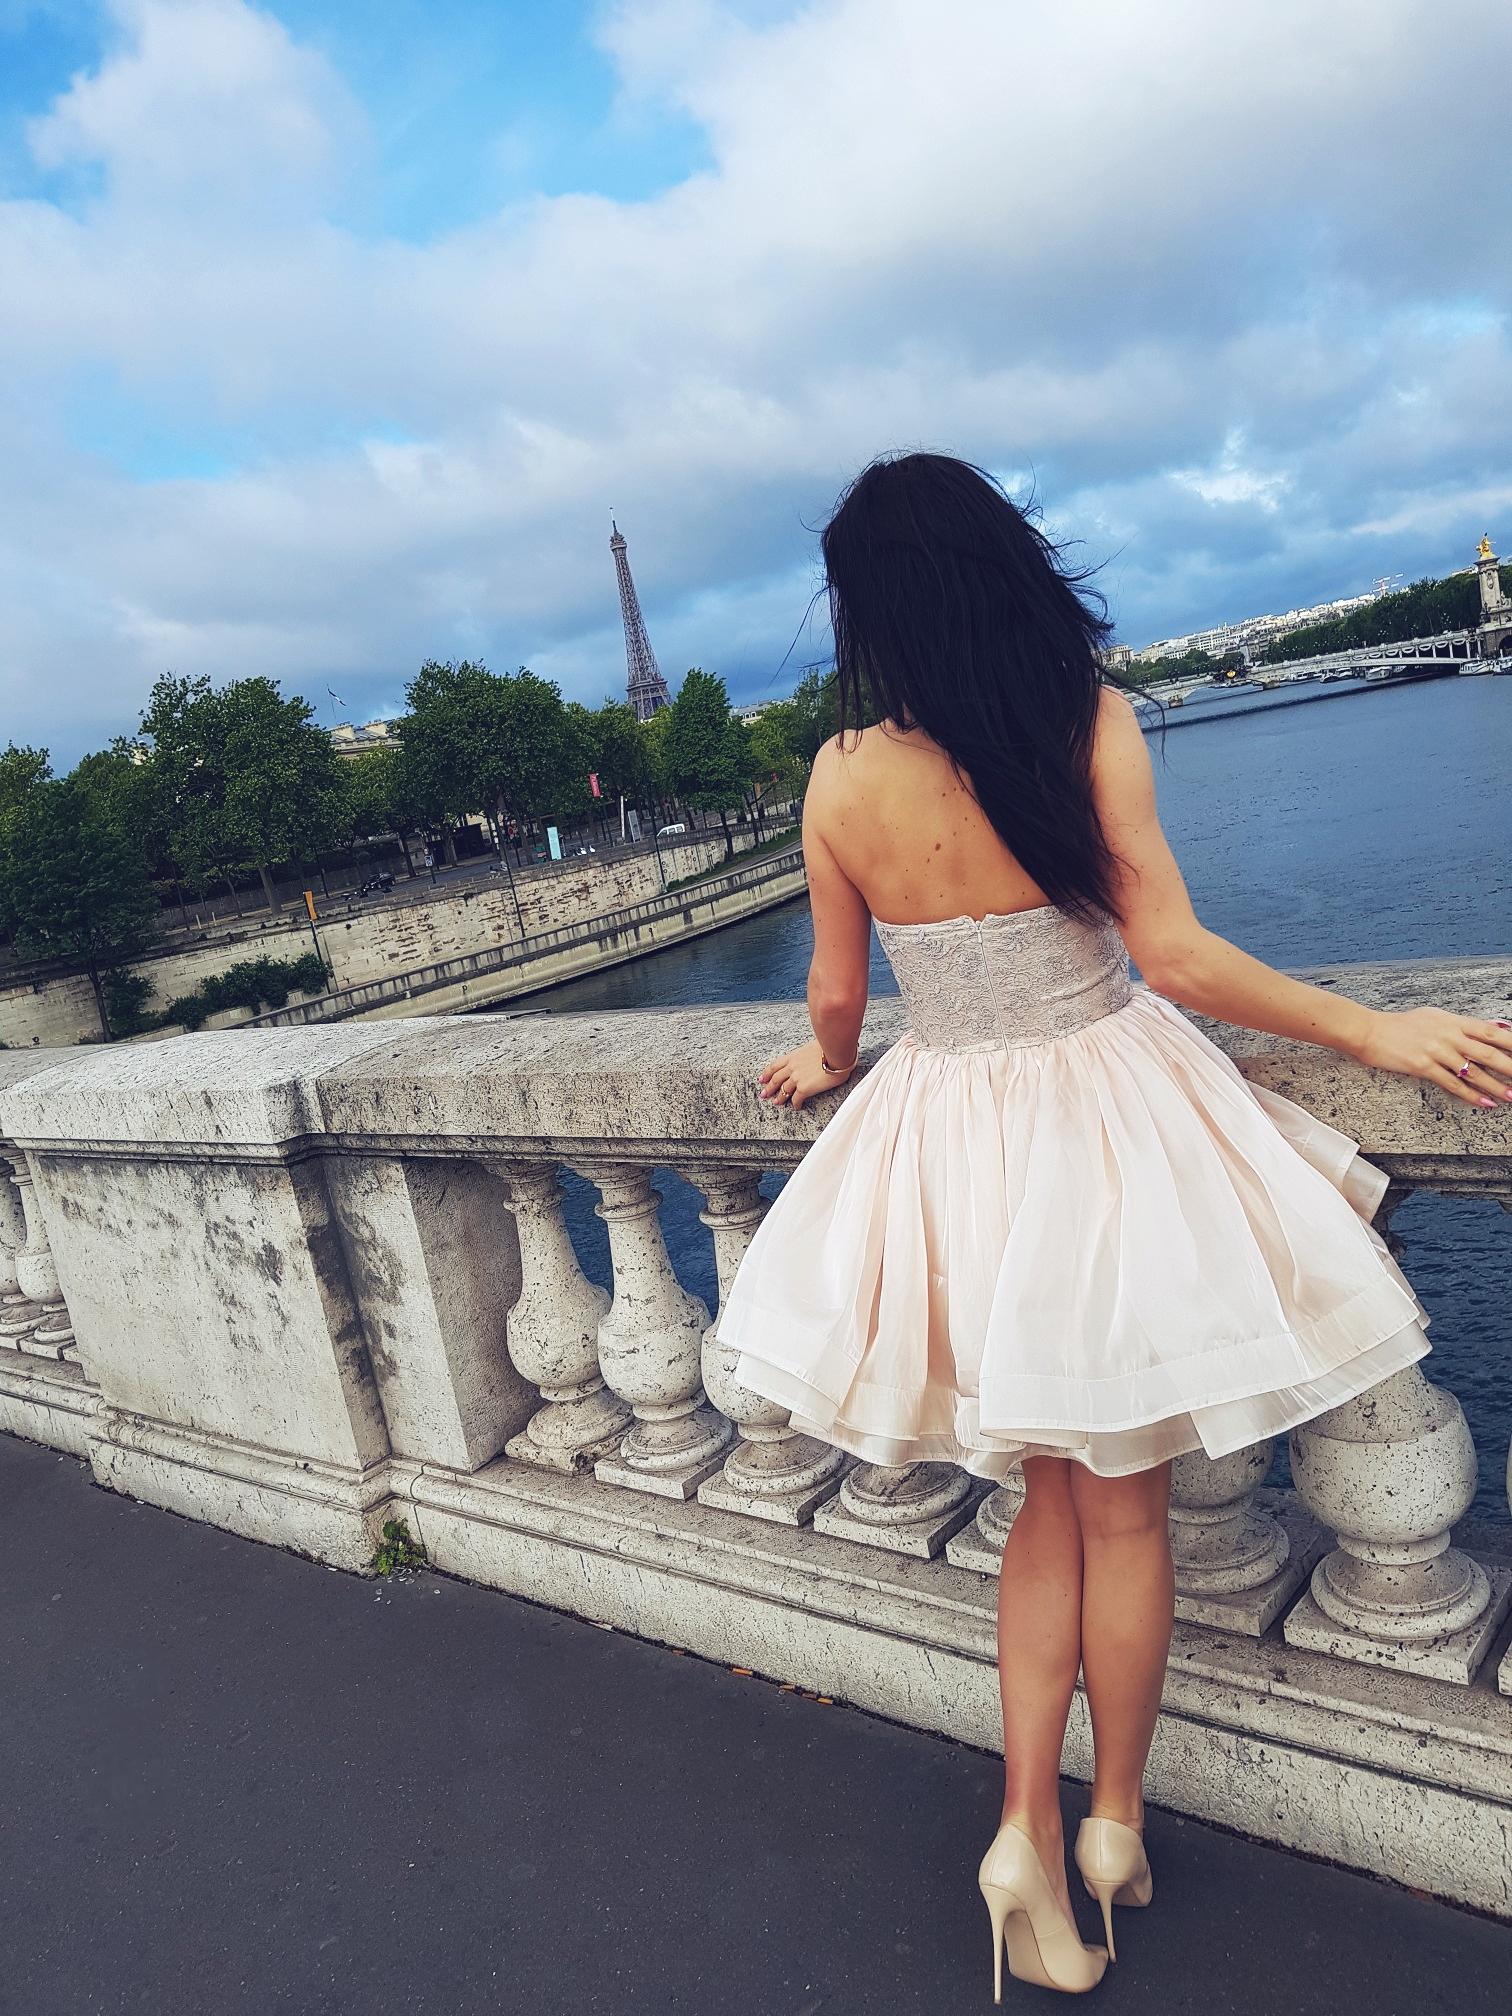 Paris girl on the bridge